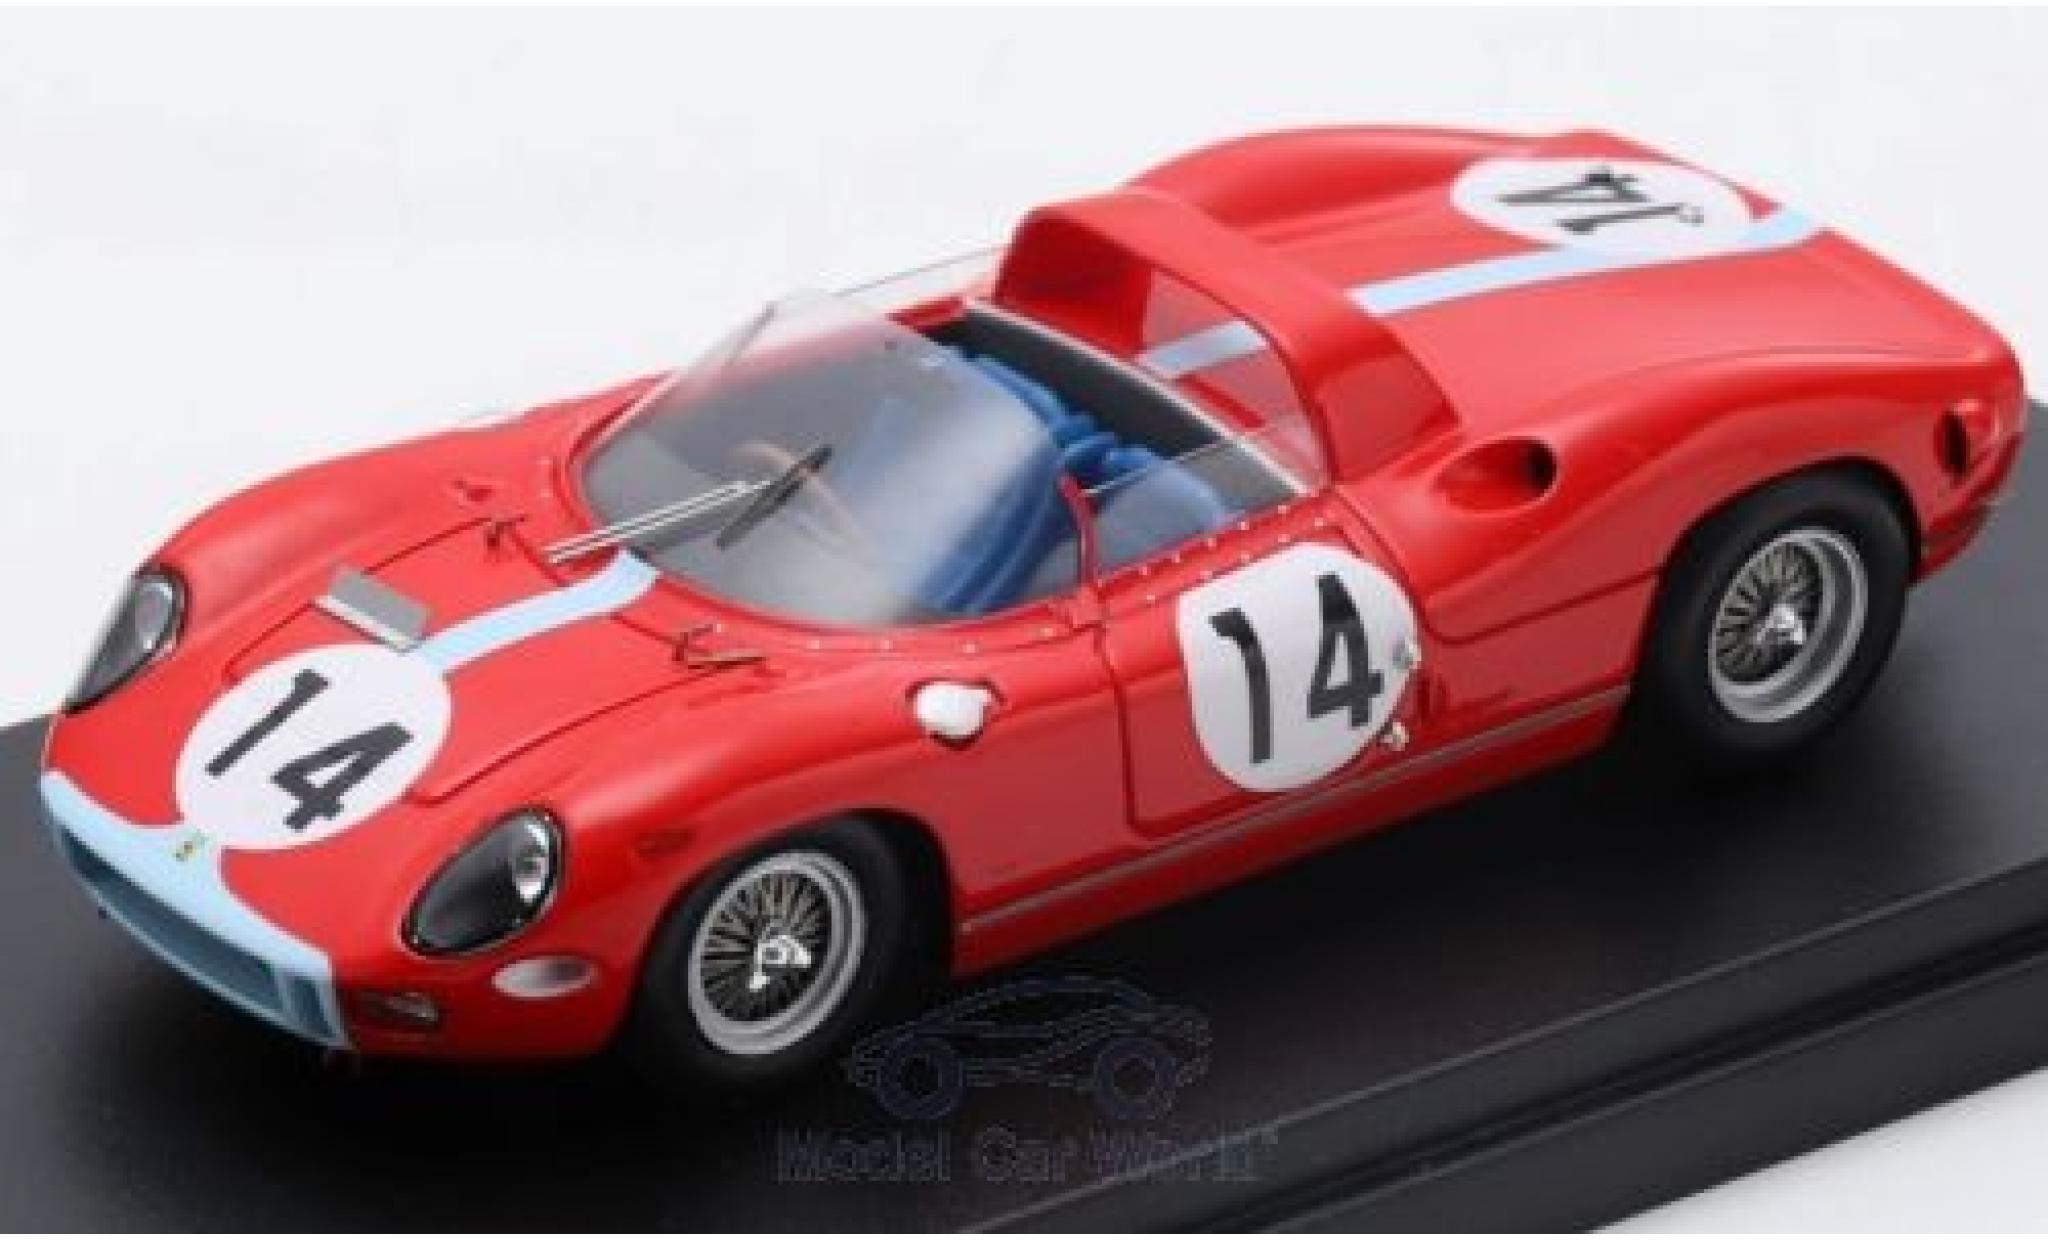 Ferrari 330 1/43 Look Smart P RHD No.14 Scuderia 24h Le Mans 1964 G.Hill/J.Bonnier